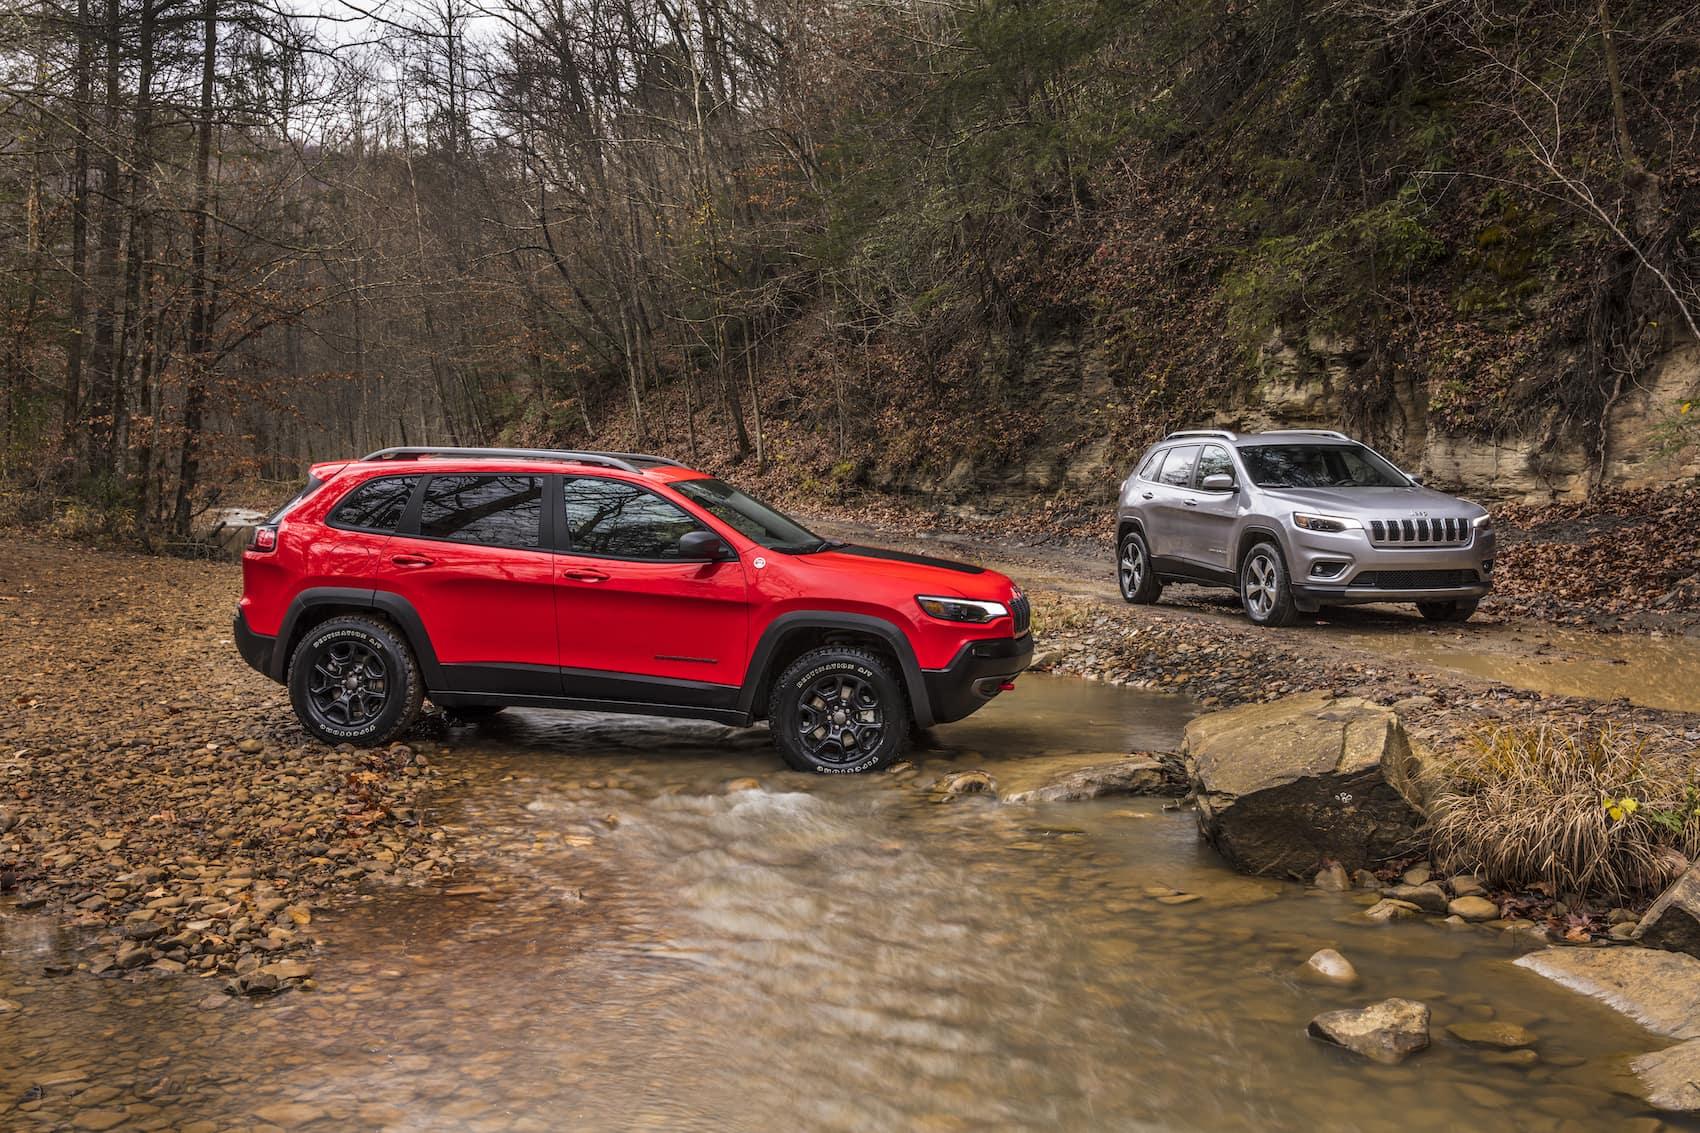 2021 Jeep Cherokee vs Grand Cherokee: Safety